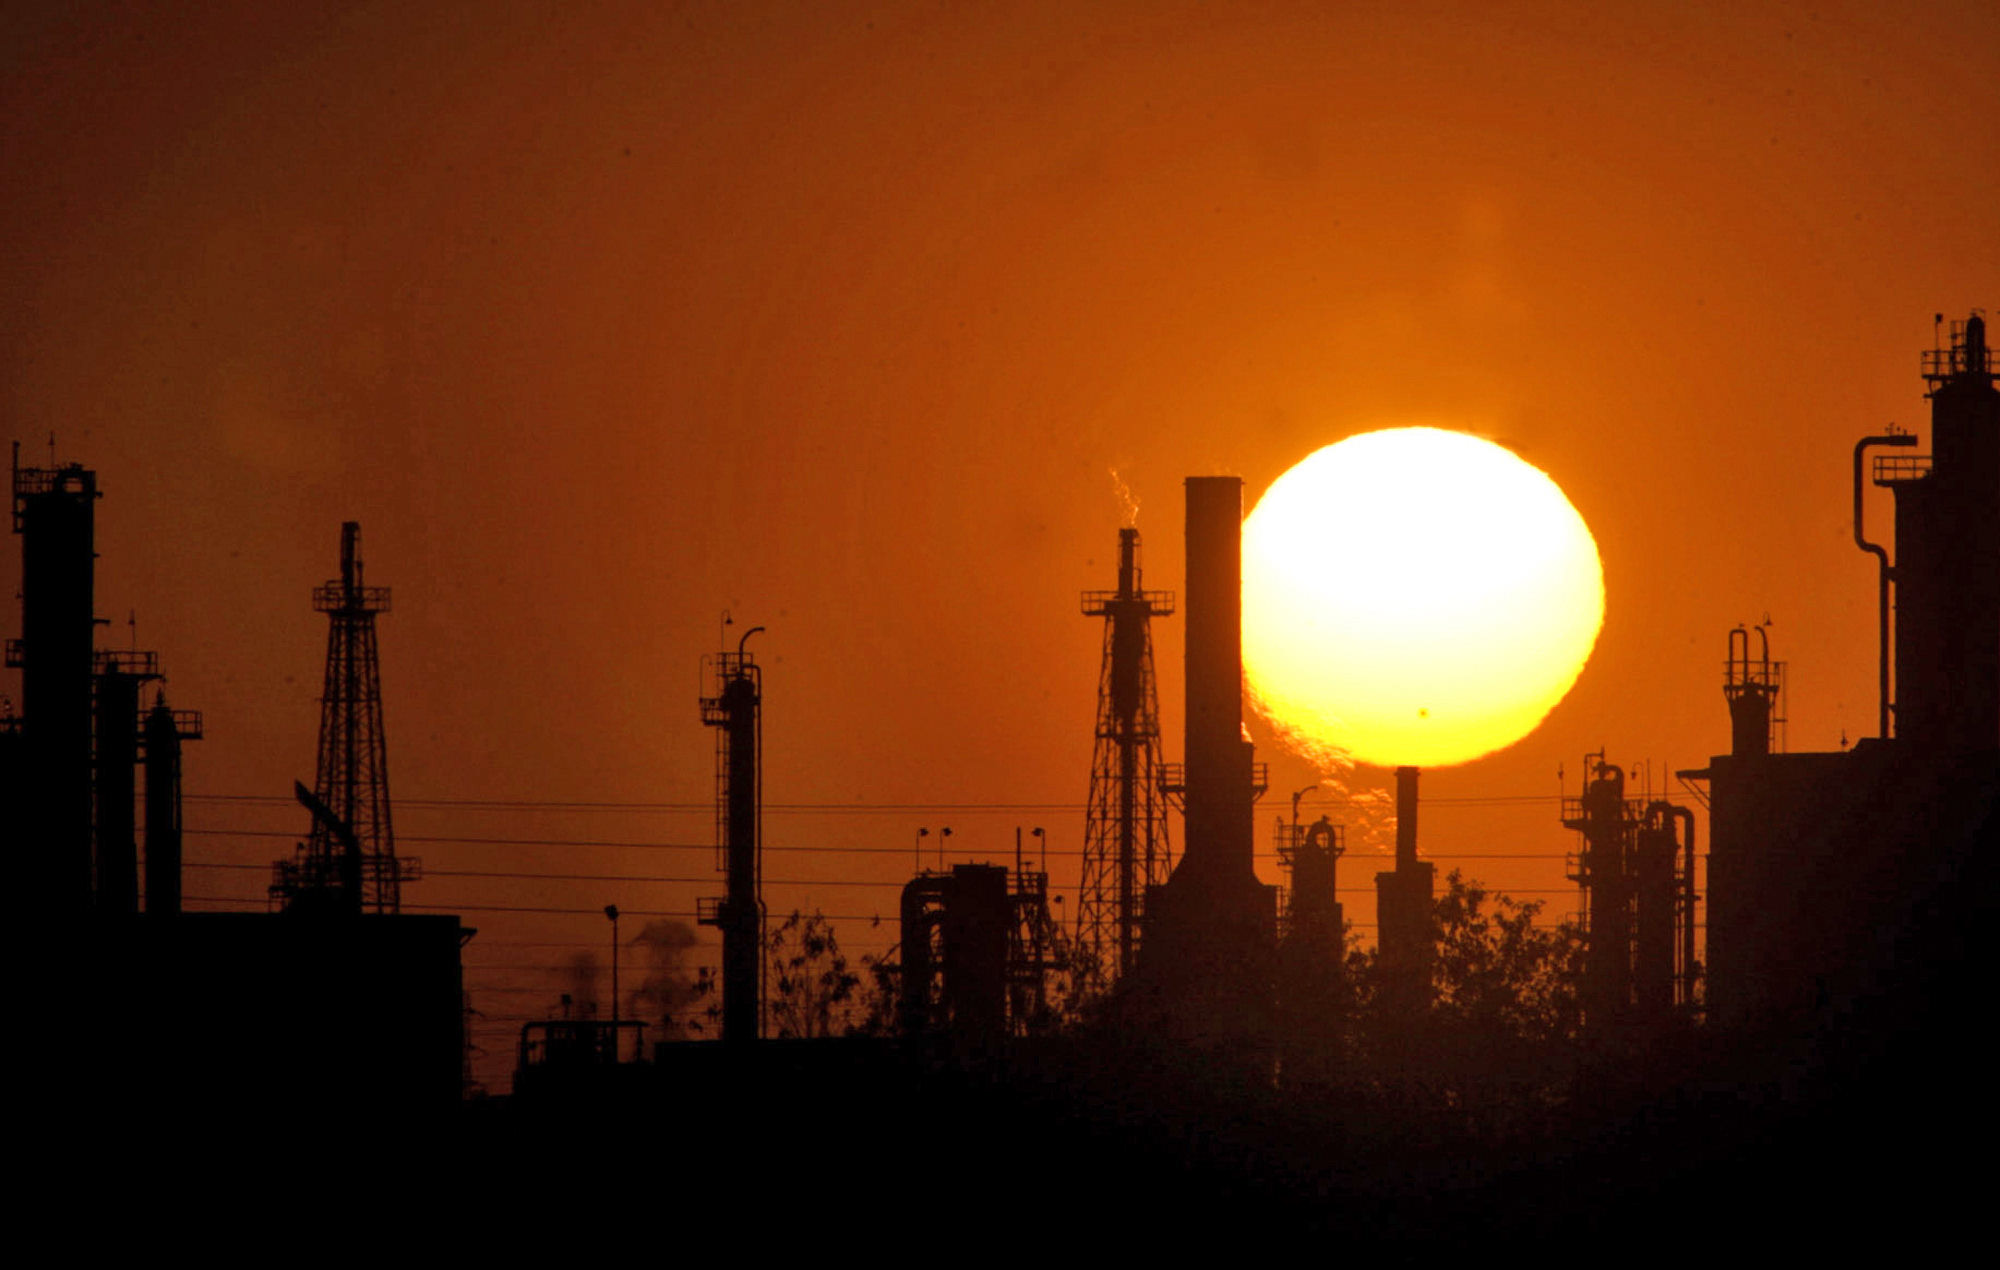 Some California Oil Fields Dirtier Than Tar Sands Crude